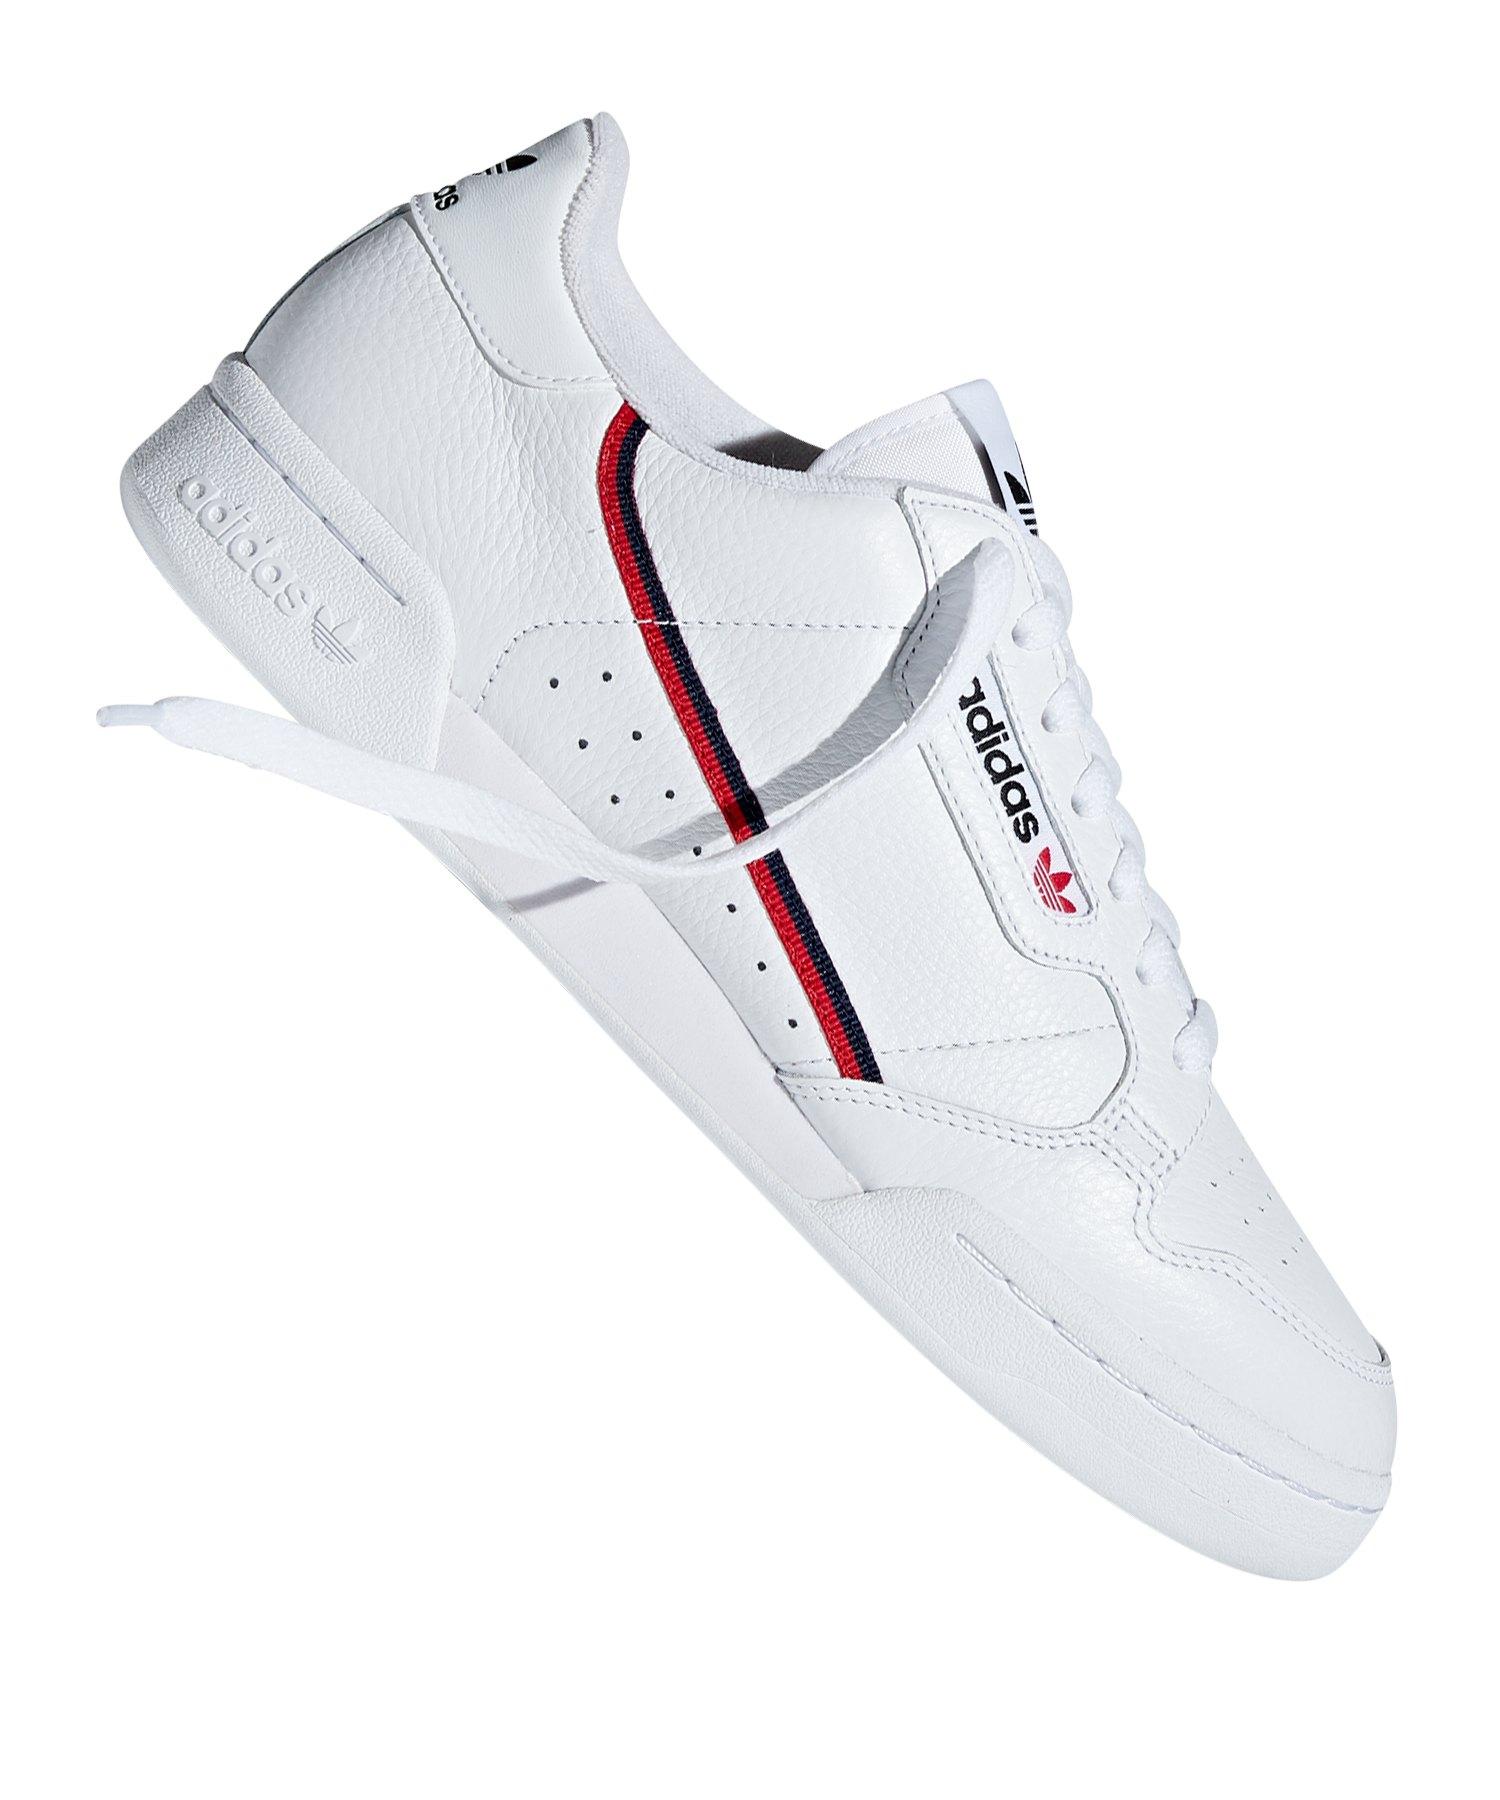 ADIDAS CONTINENTAL 80, 43 13, UK 9 Herren Sneaker grau